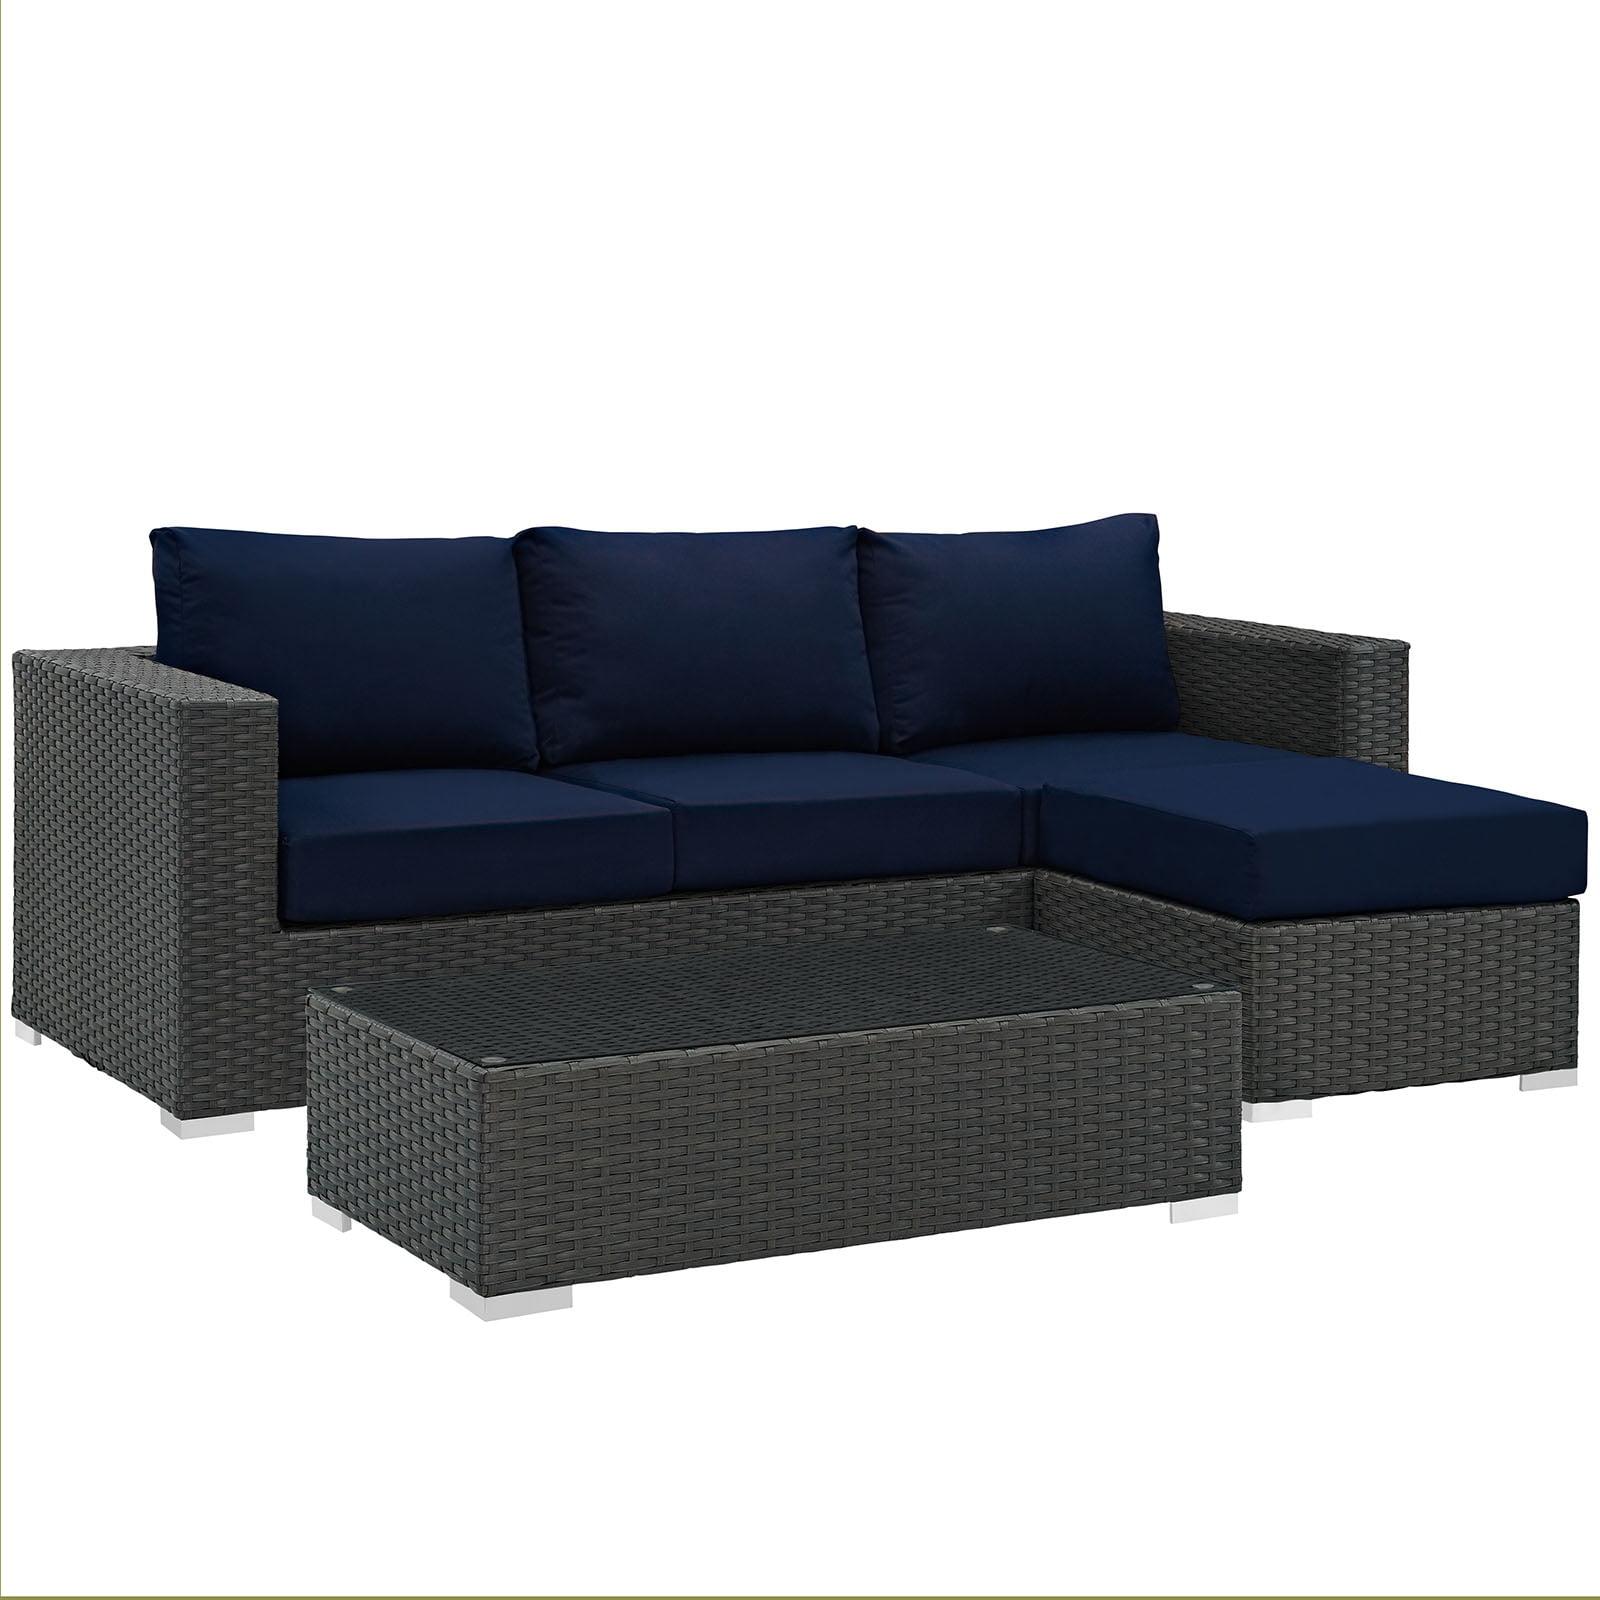 Modern Contemporary Urban Design Living Lounge Room Sectional Sofa Set, Navy Blue, Rattan